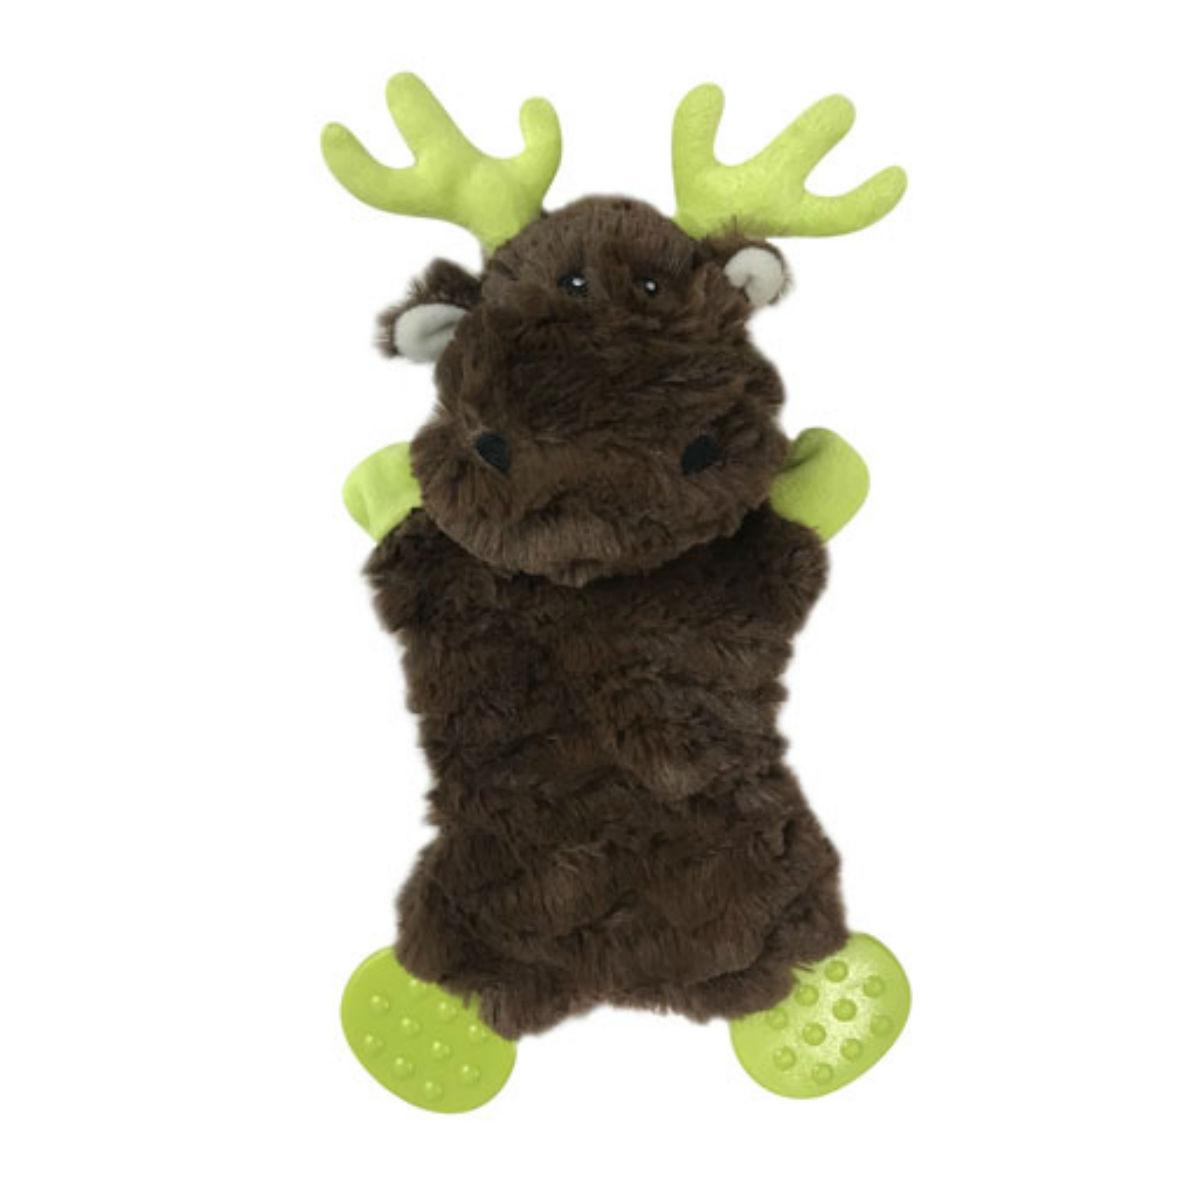 Pet Park Blvd Flatties Plush Toy - Moose